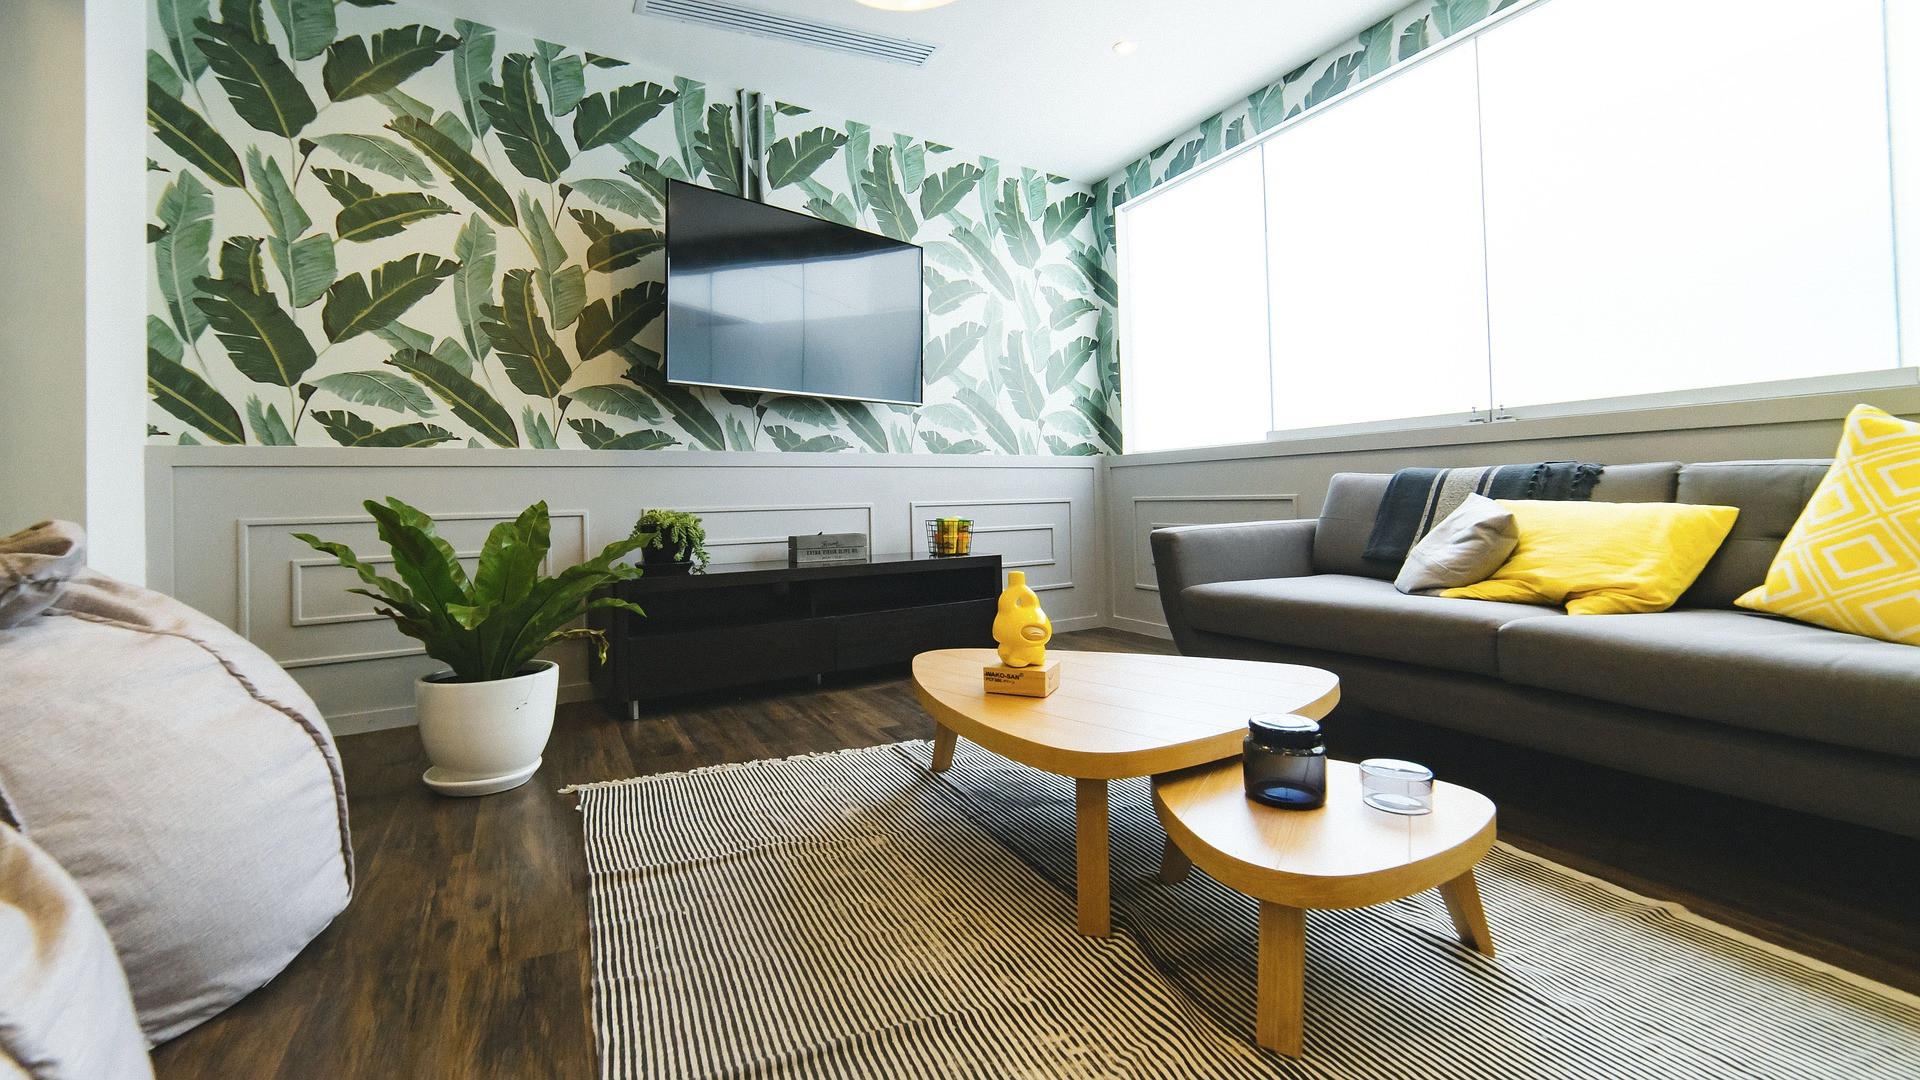 acheter un support mural tv nos conseils. Black Bedroom Furniture Sets. Home Design Ideas